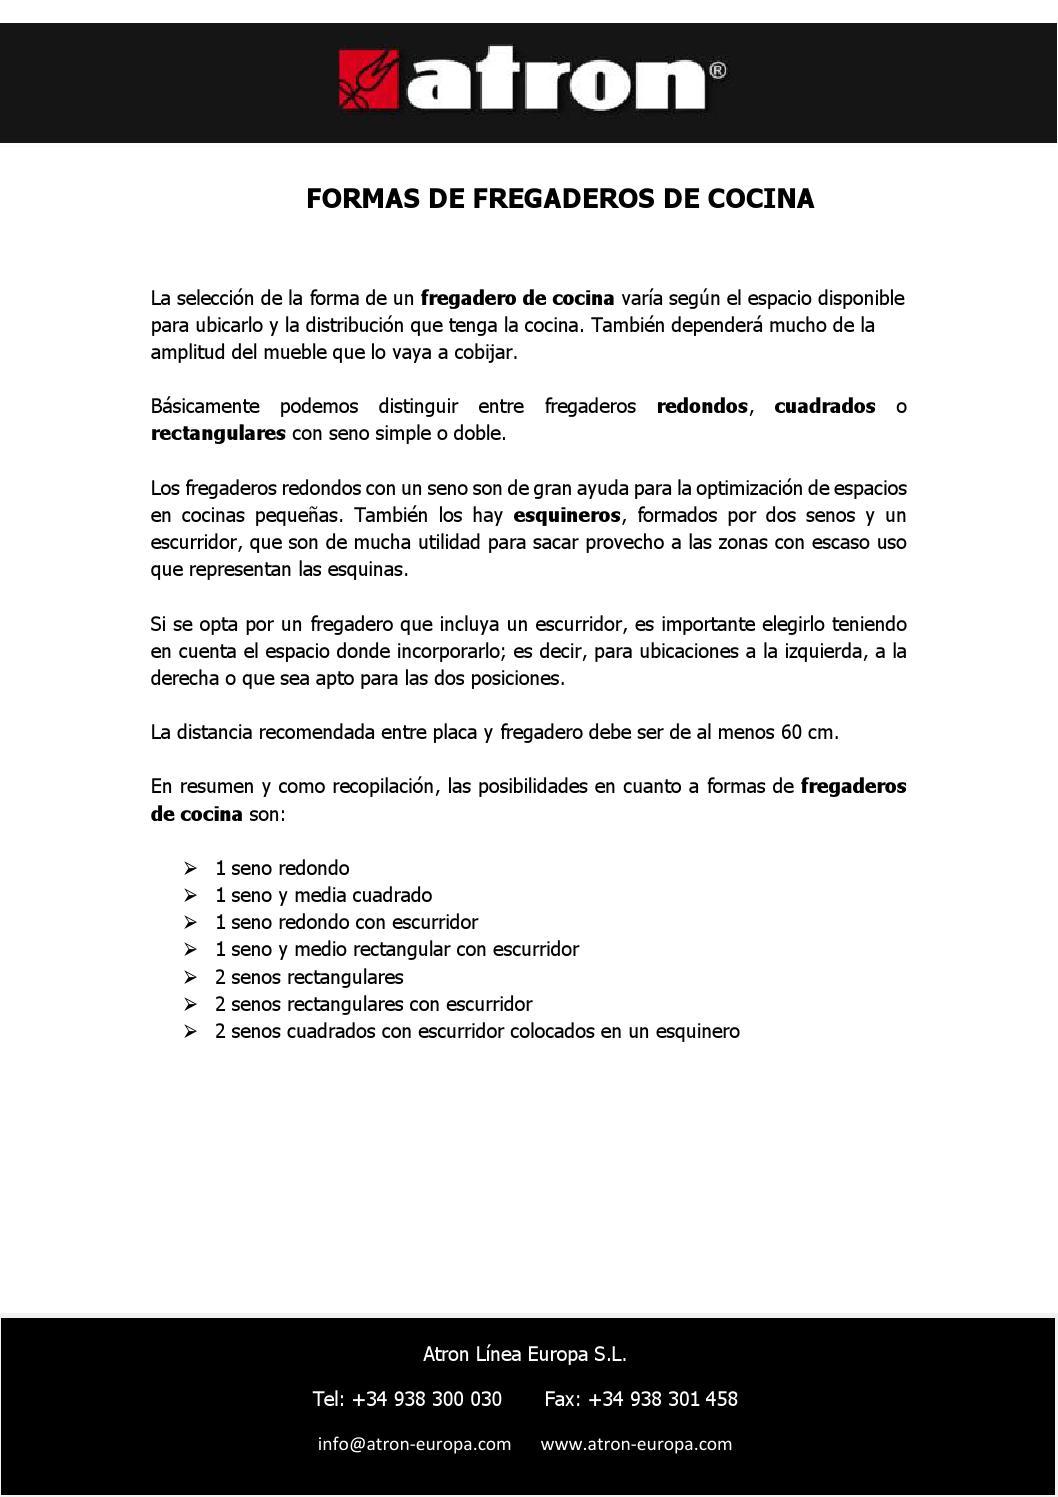 Formas de fregadero de cocina by atron fregaderos issuu - Fregaderos atron ...